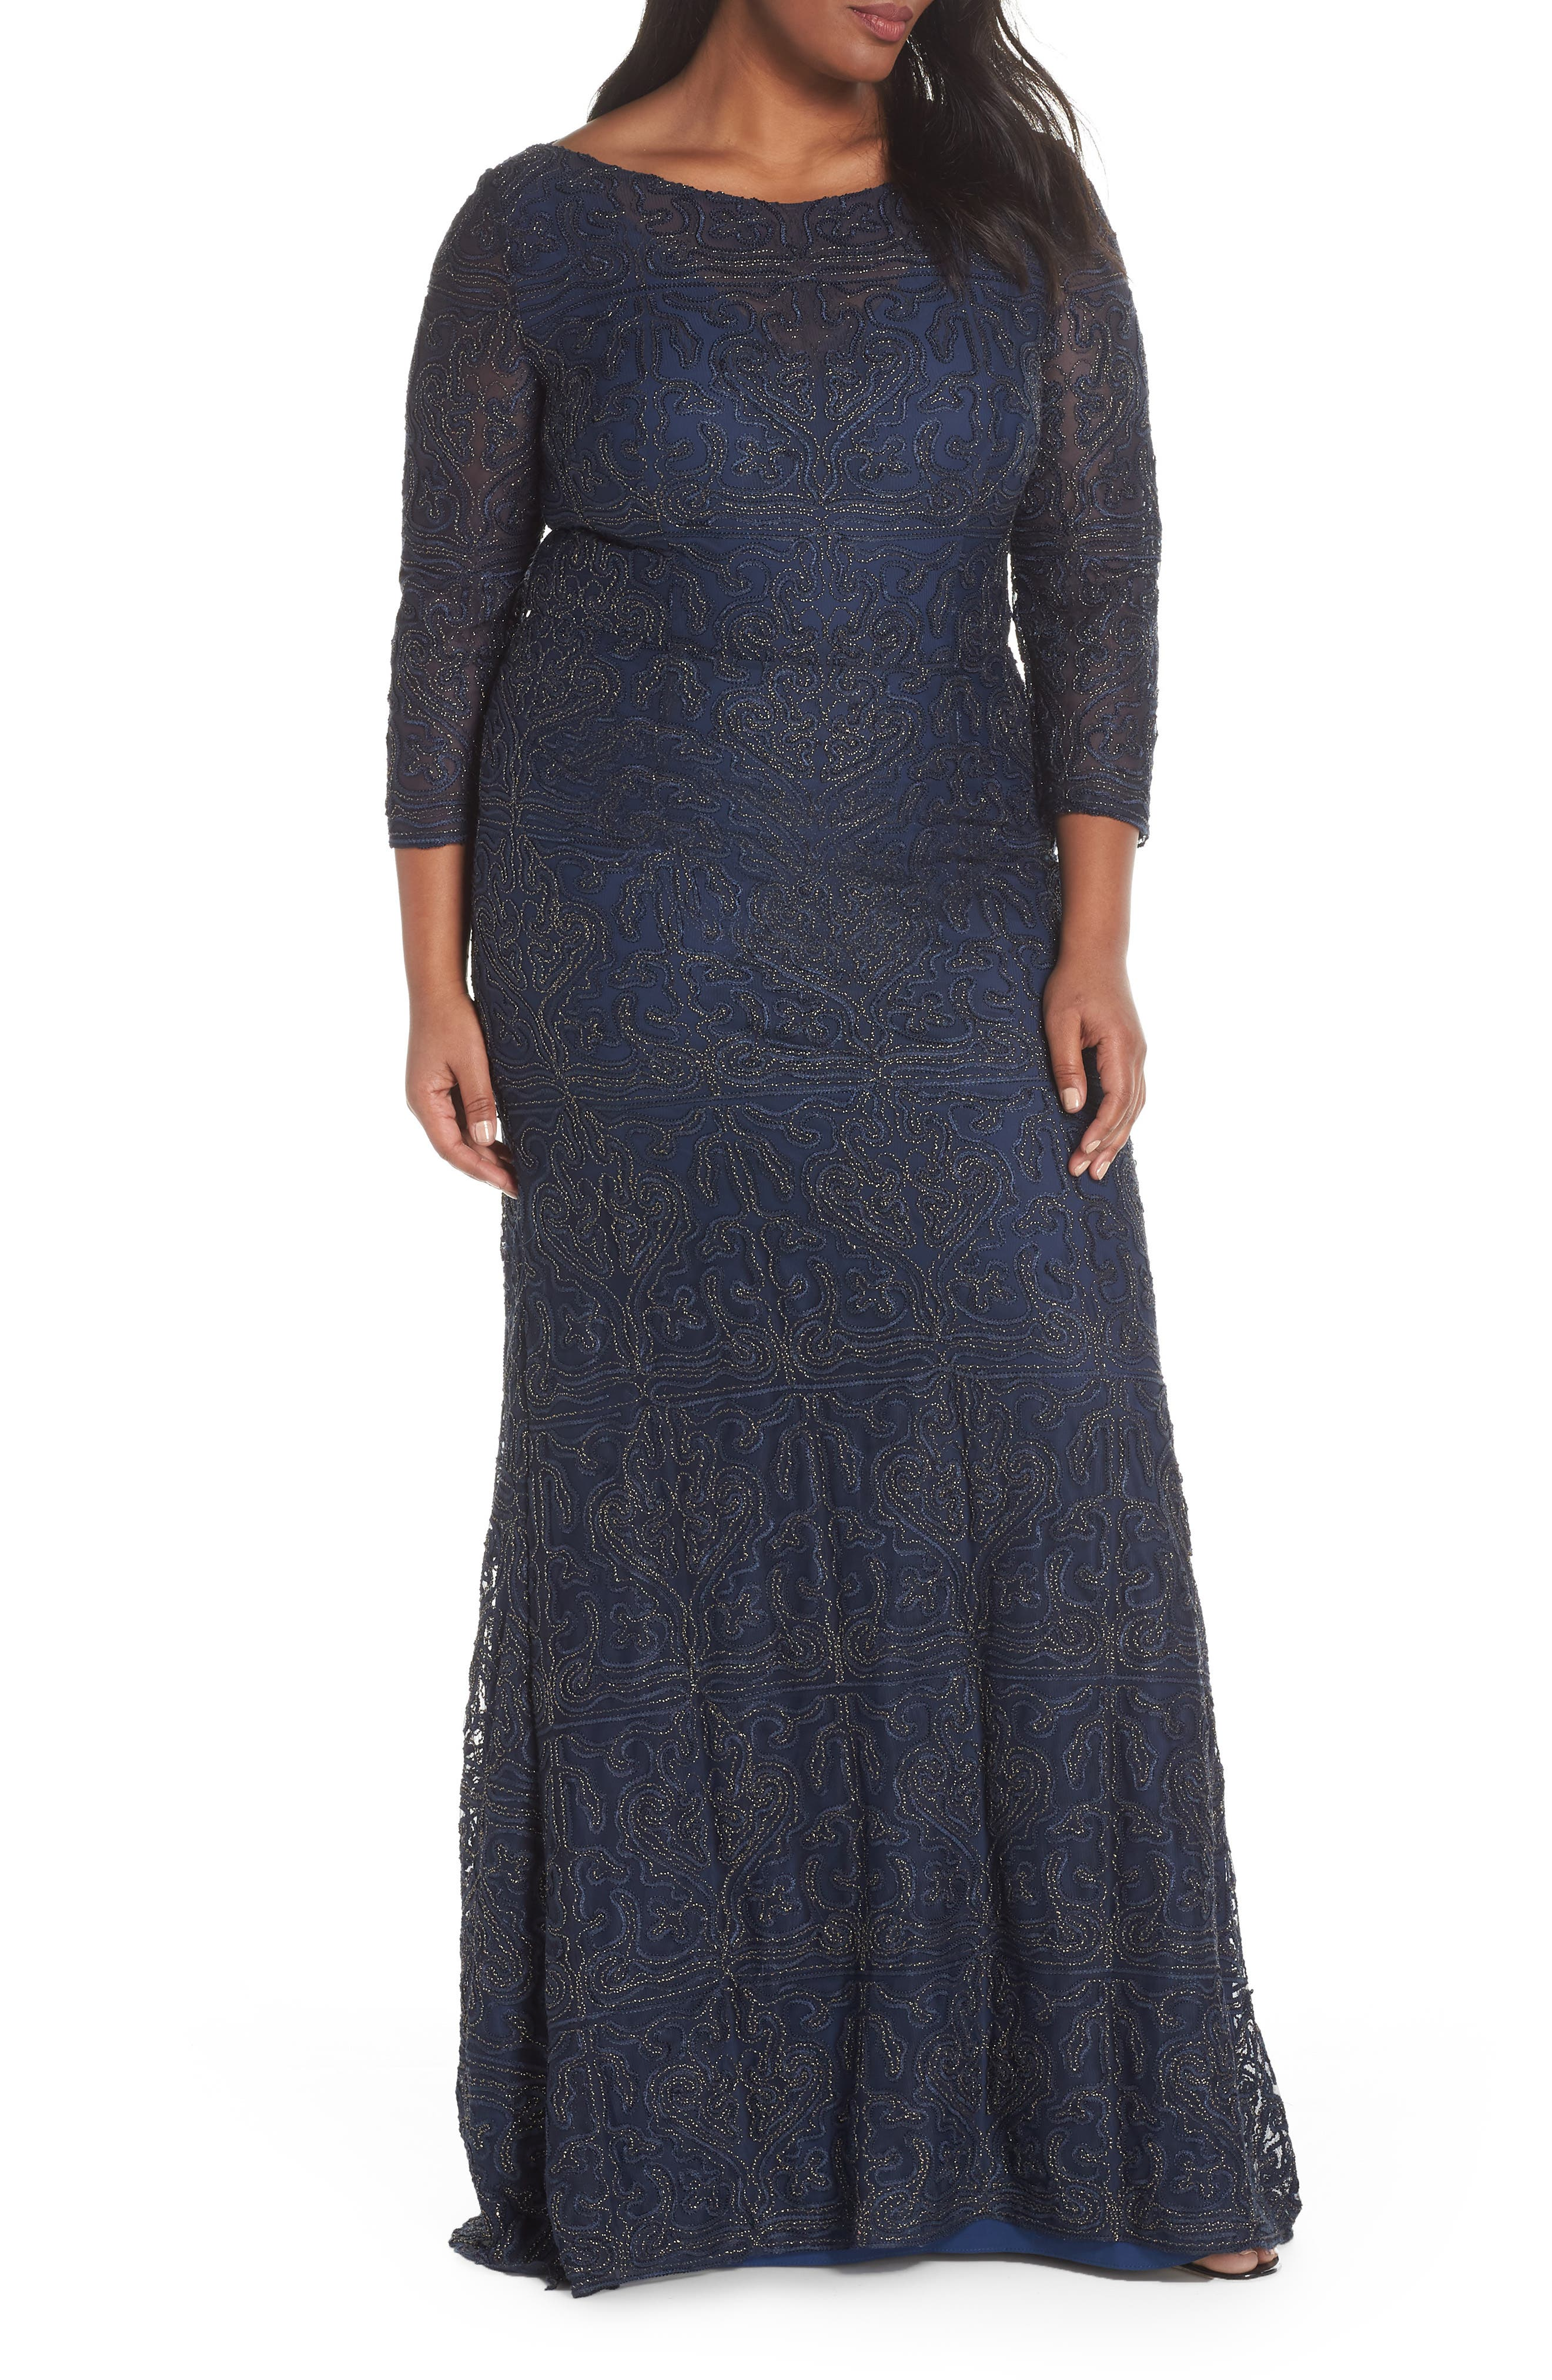 JS COLLECTIONS Metallic Soutache Gown, Main, color, NAVY / GOLD